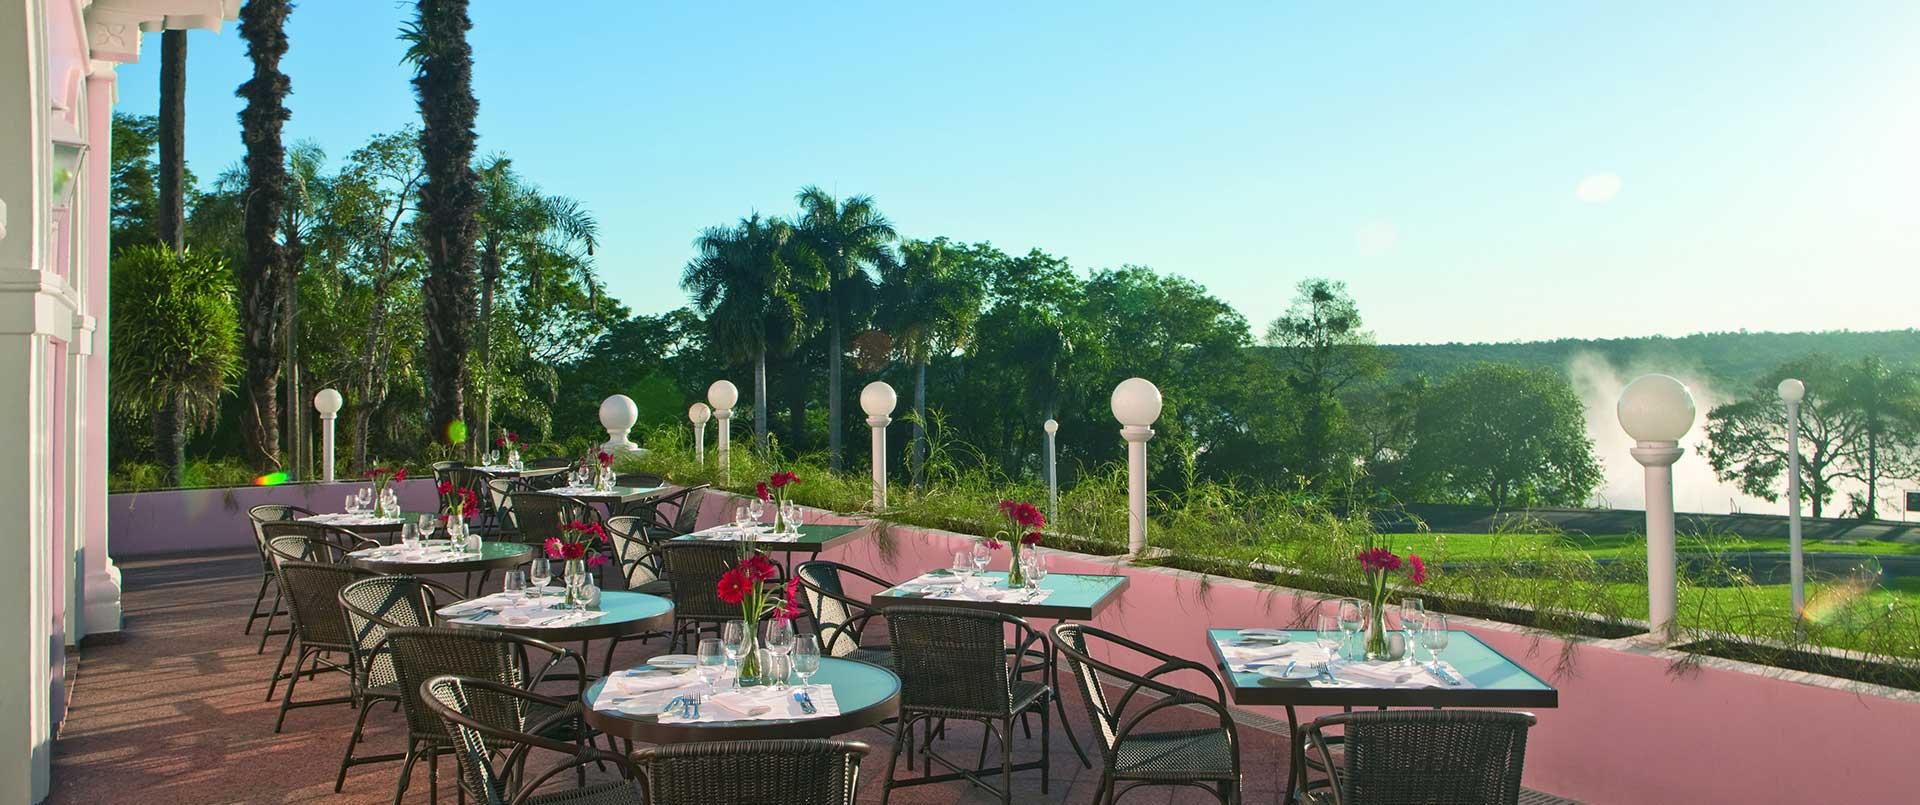 Belmond Hotel das Cataratas, Iguazu Falls